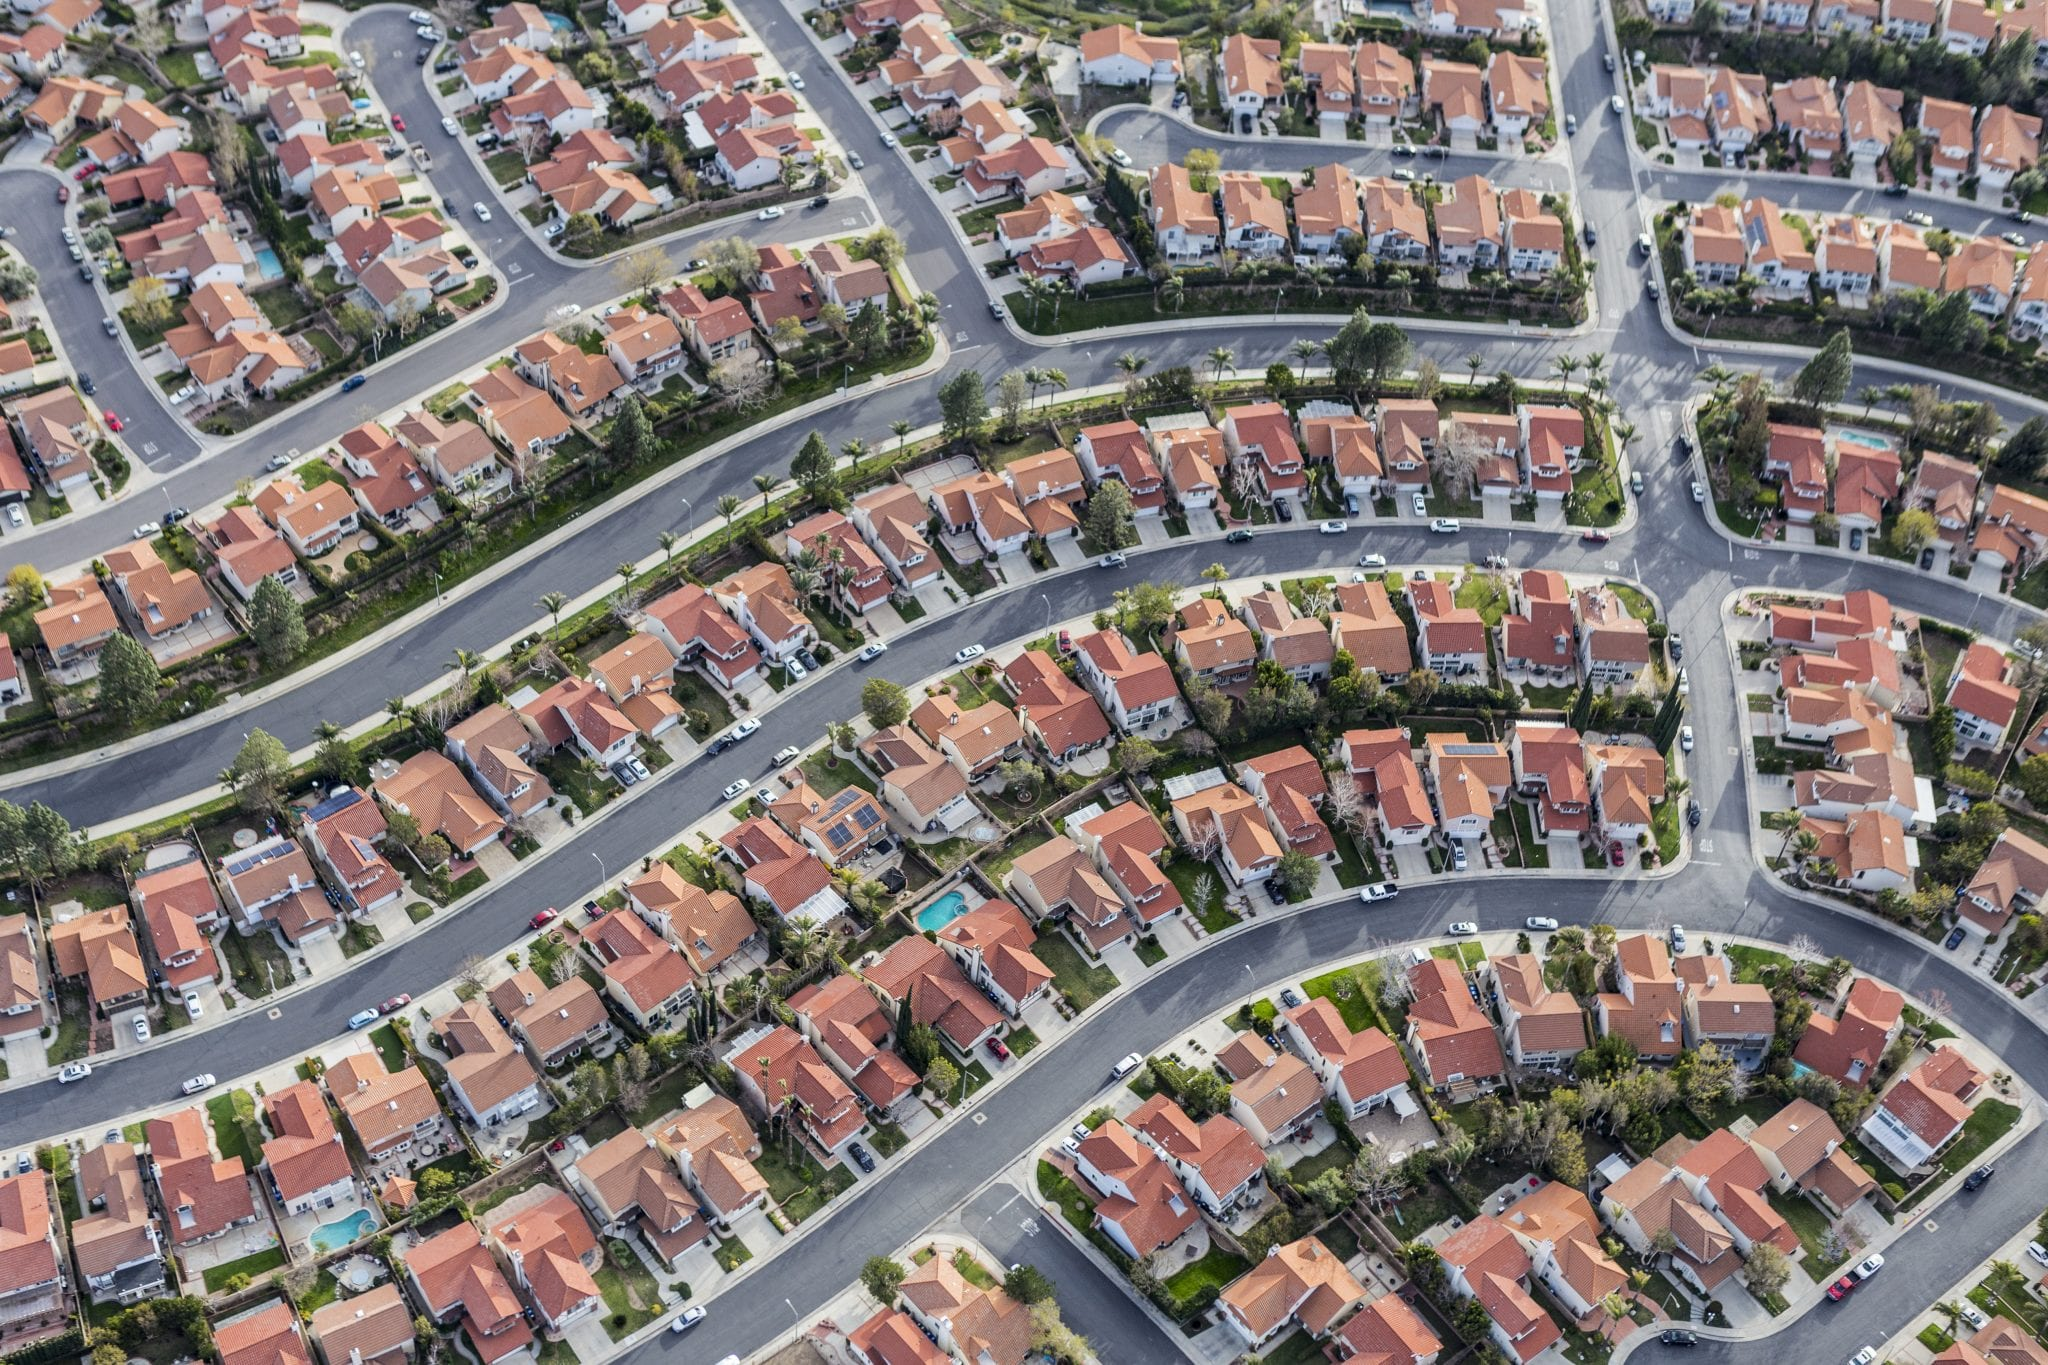 Aerial view of a neighborhood. Neighborhoods often have an HOA.